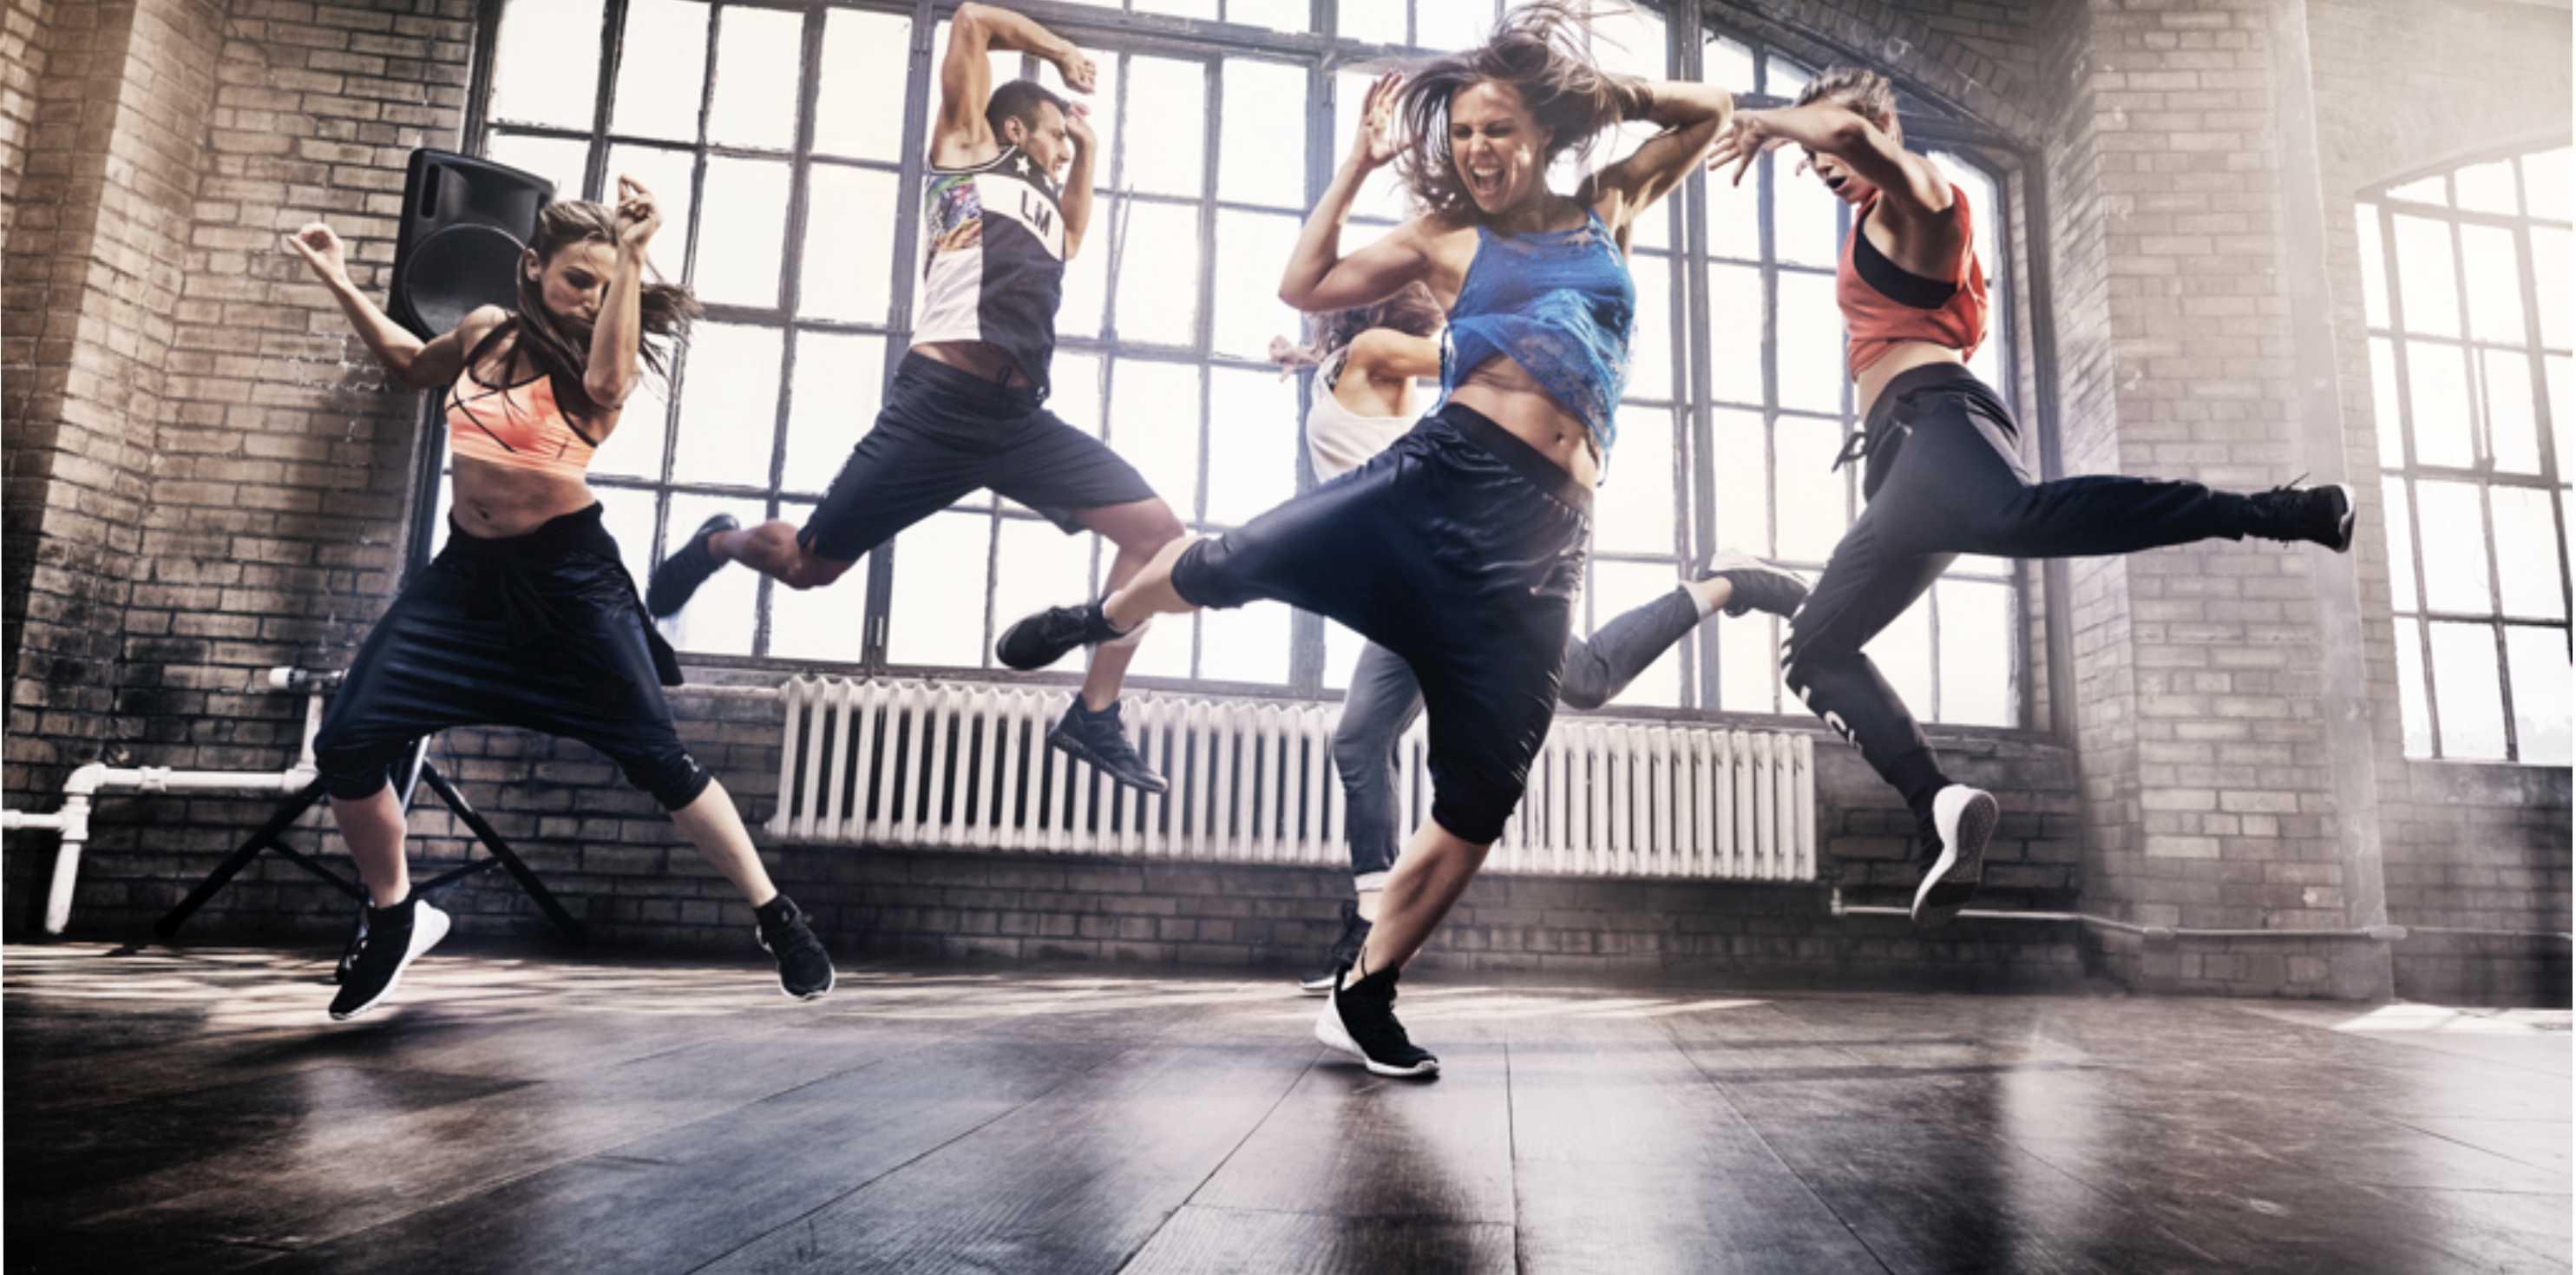 фитнес группы